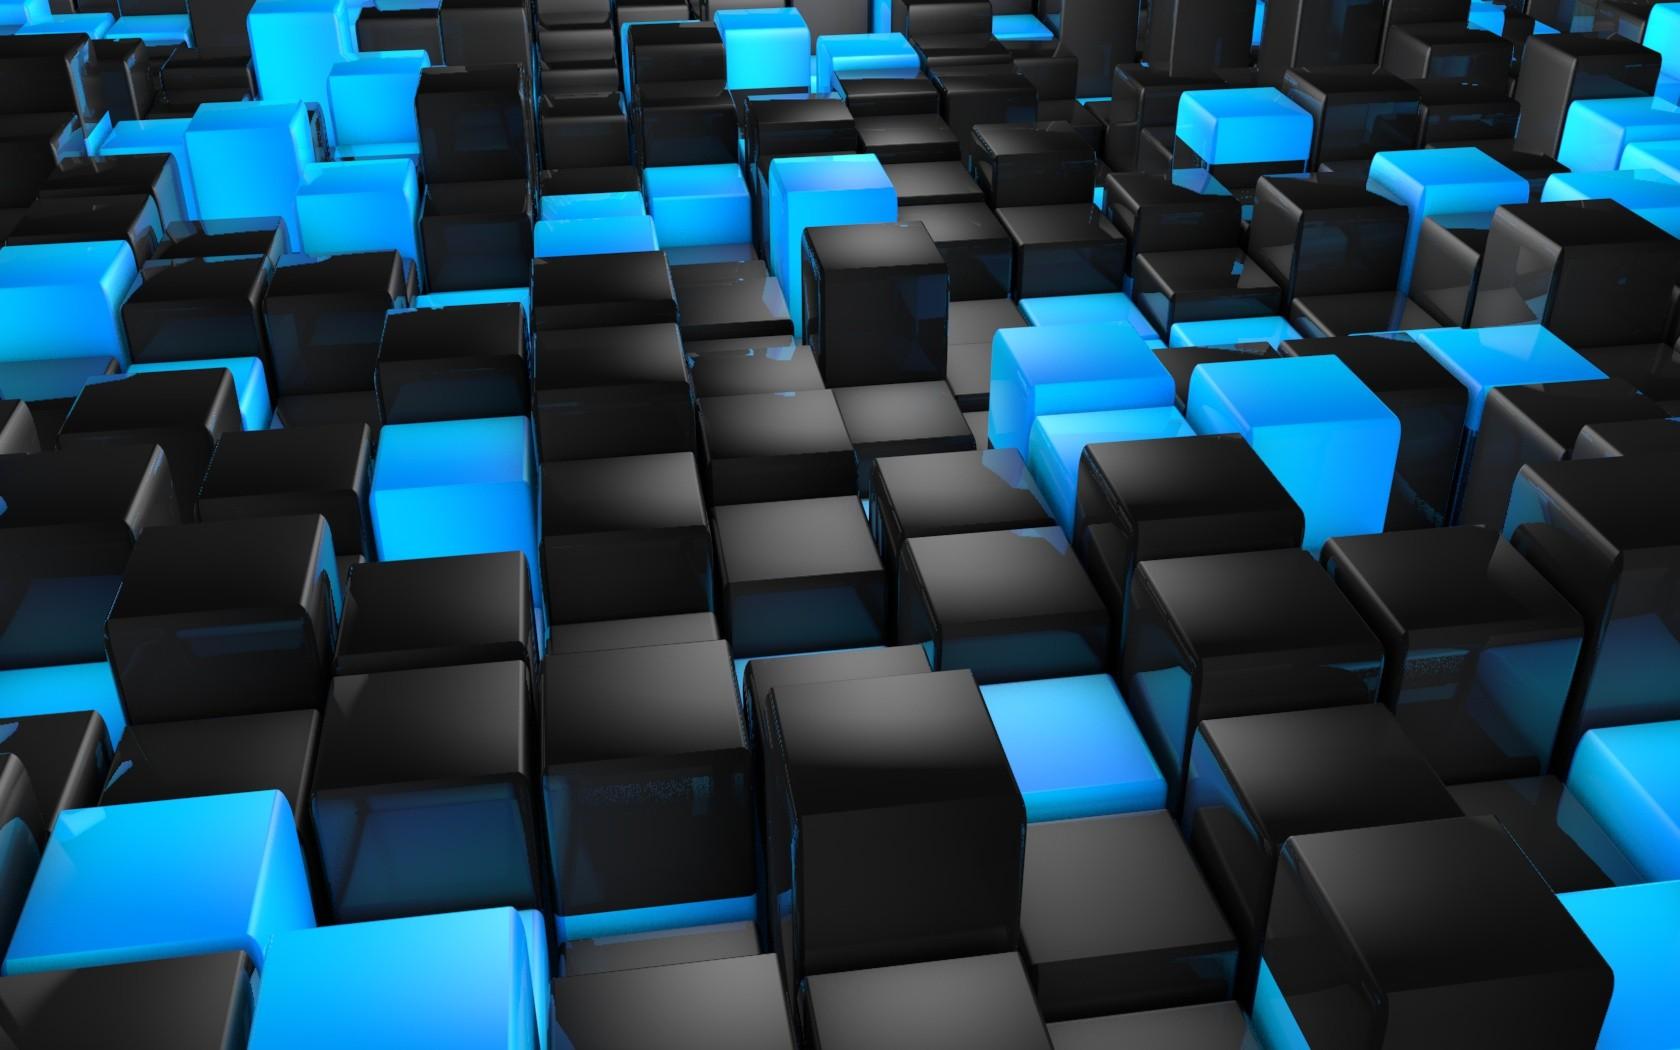 3D Black Cube Wallpaper Hd Wallpaper Background 1680x1050